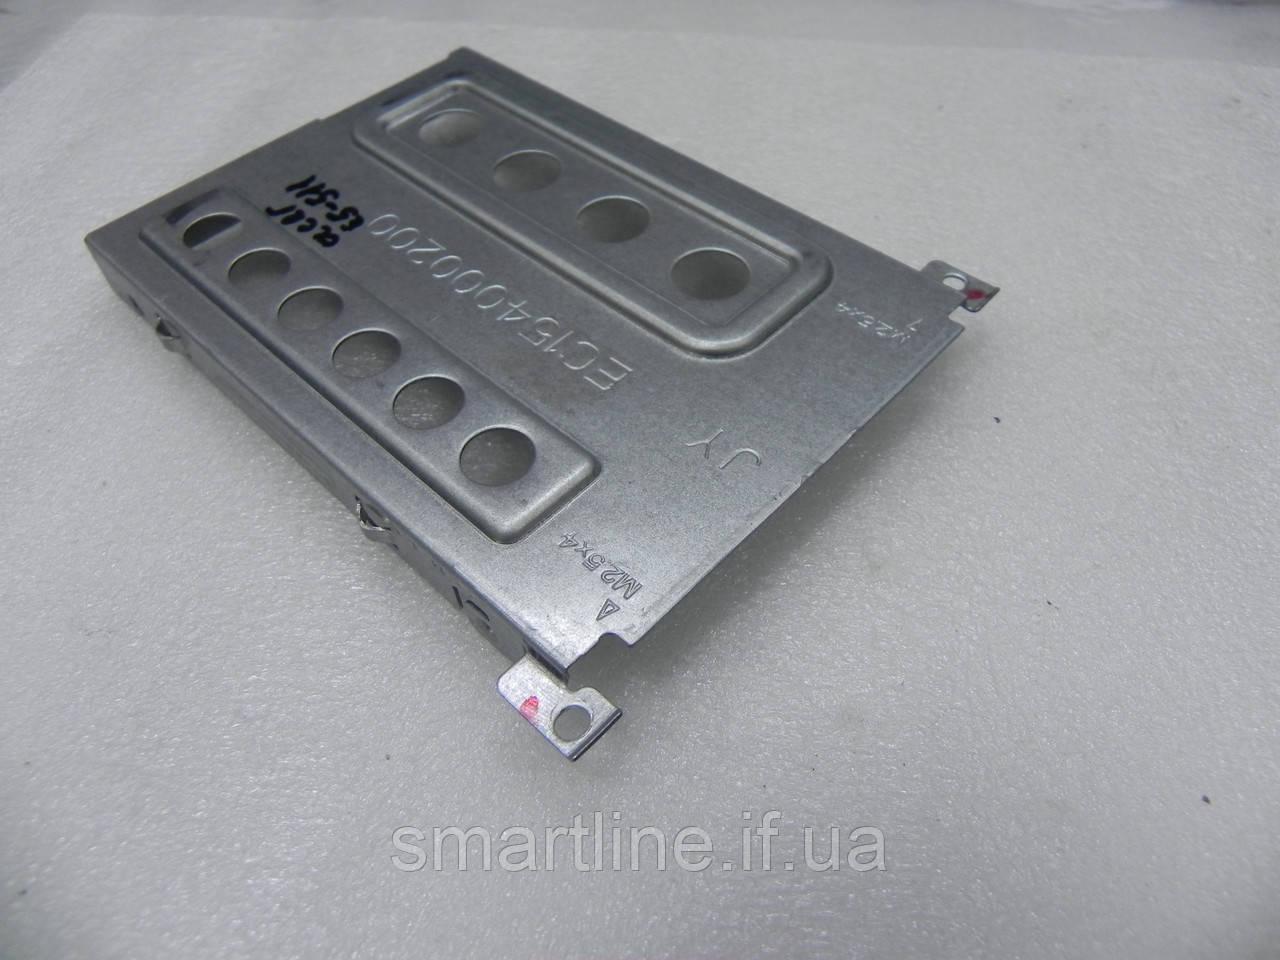 Шахта HDD для ноутбука Acer E5-521G, E5-511, Z5WAL, EC154000200, б/в